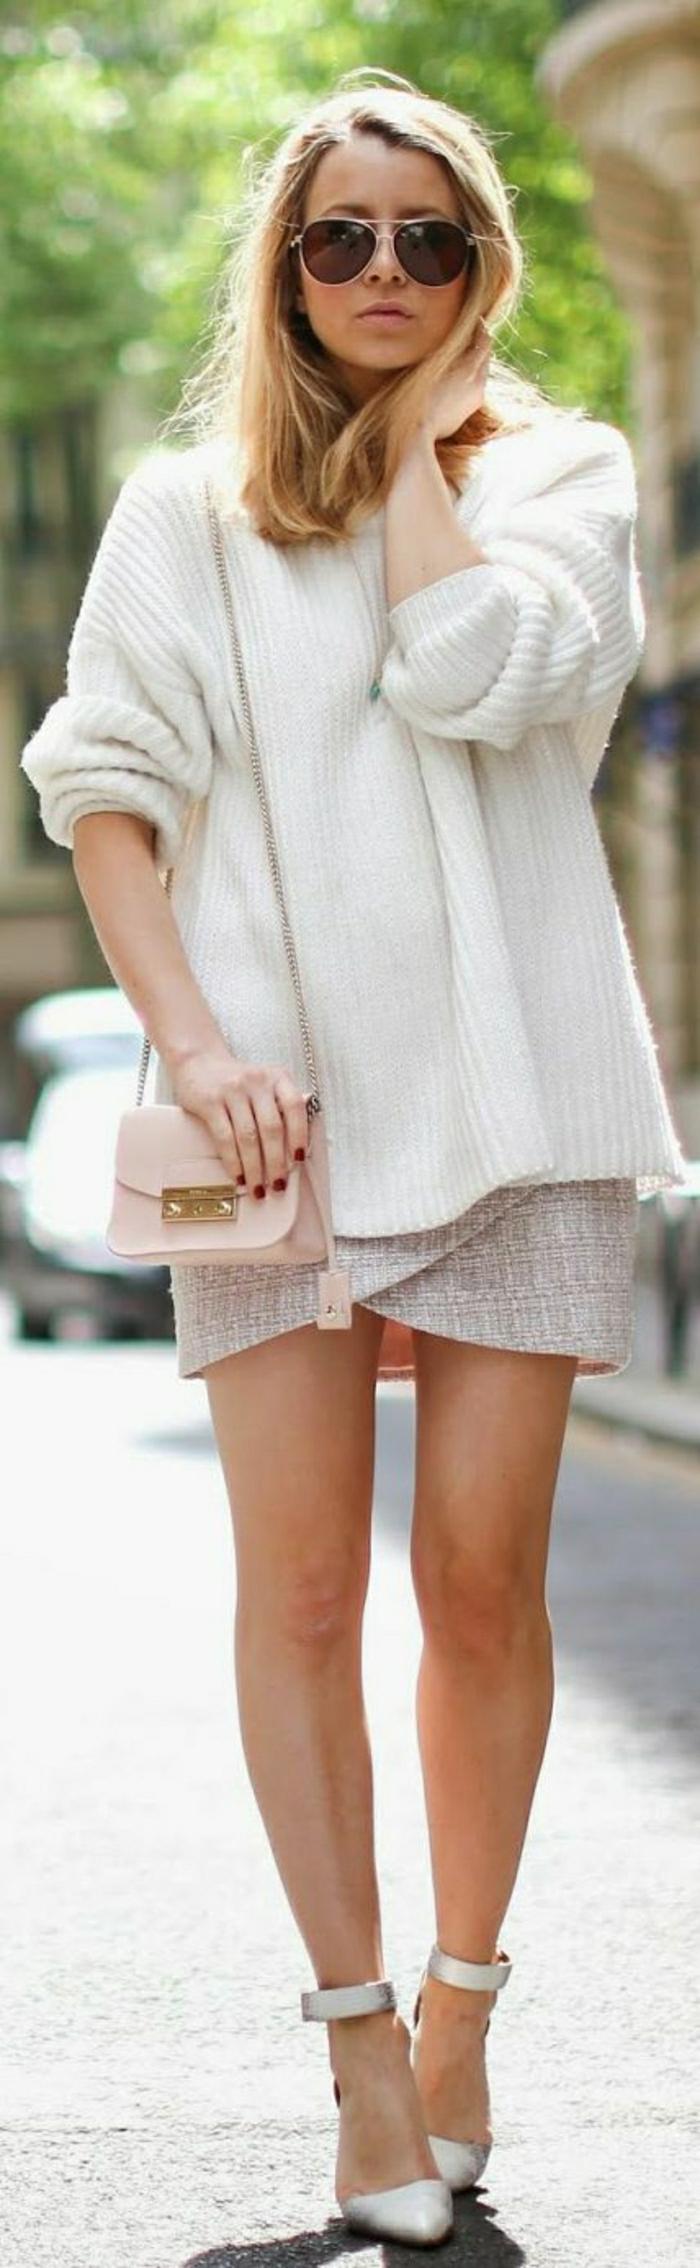 Caroline-Louis-Kleidung-Pastellfarben-Mini-Tasche-Furla